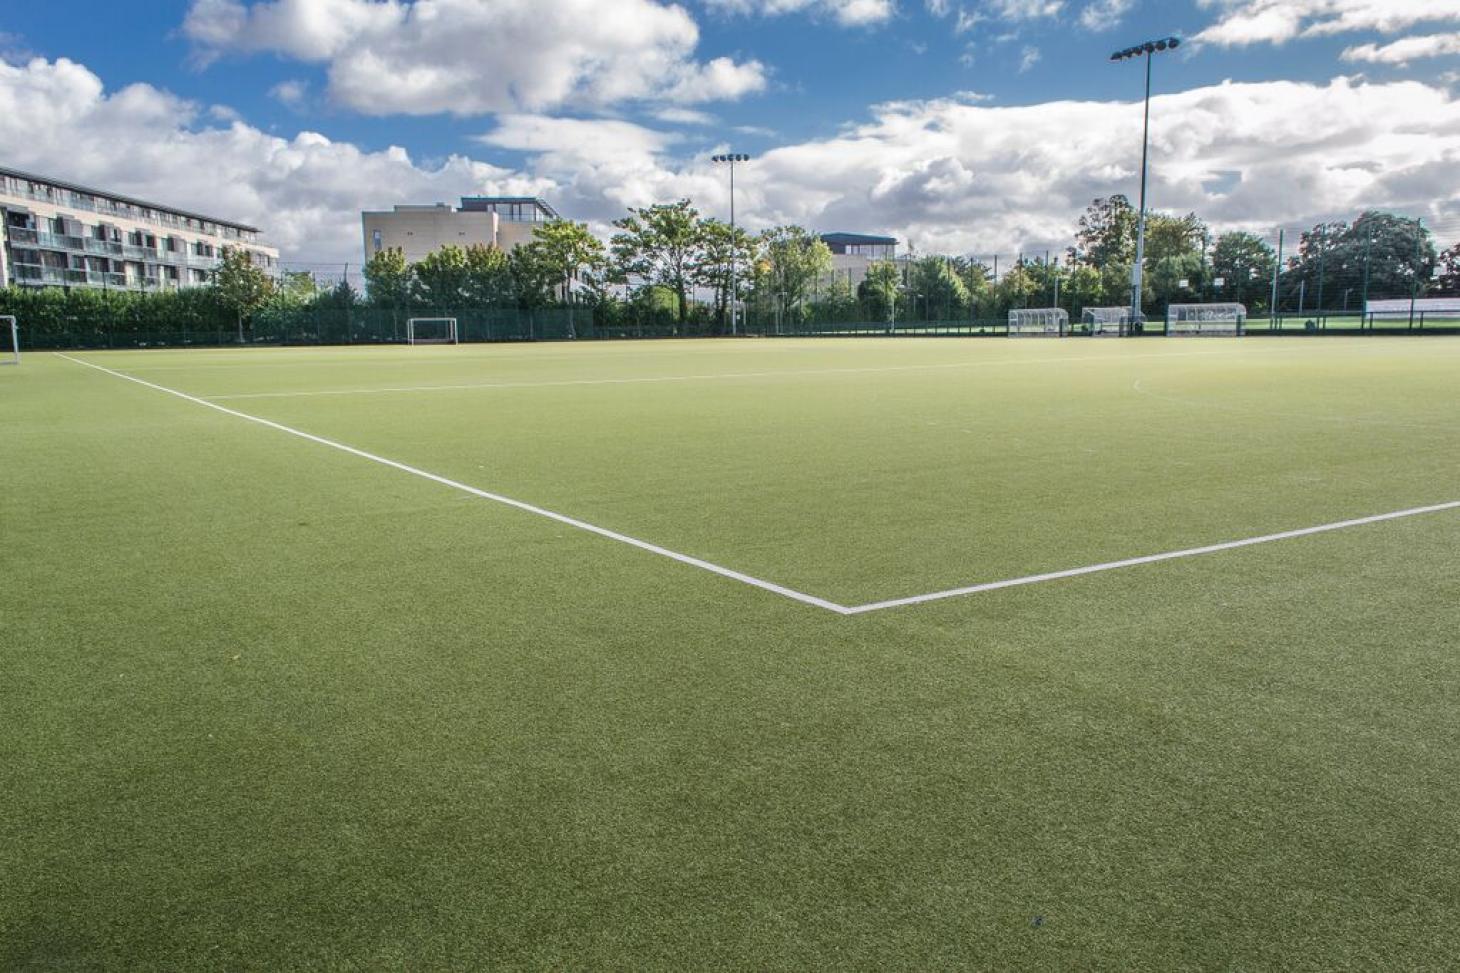 Alexandra College Outdoor   Astroturf hockey pitch